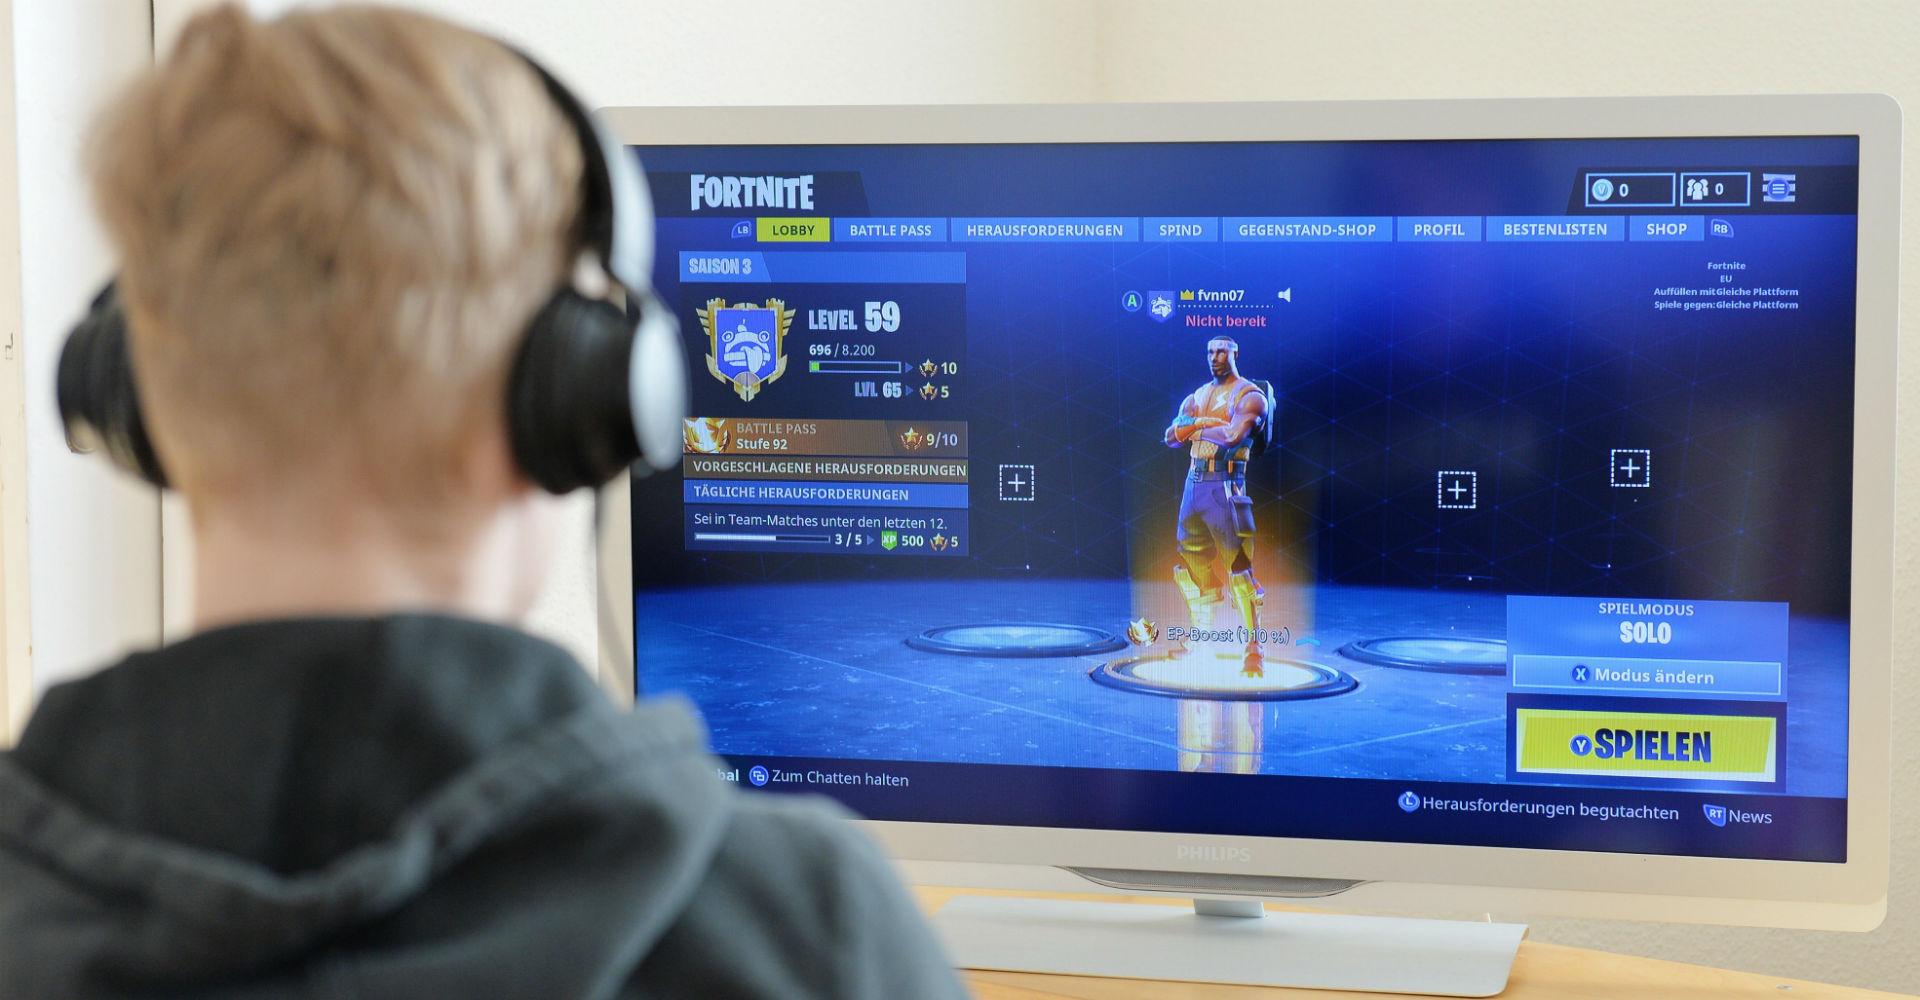 Während er Fortnite spielt